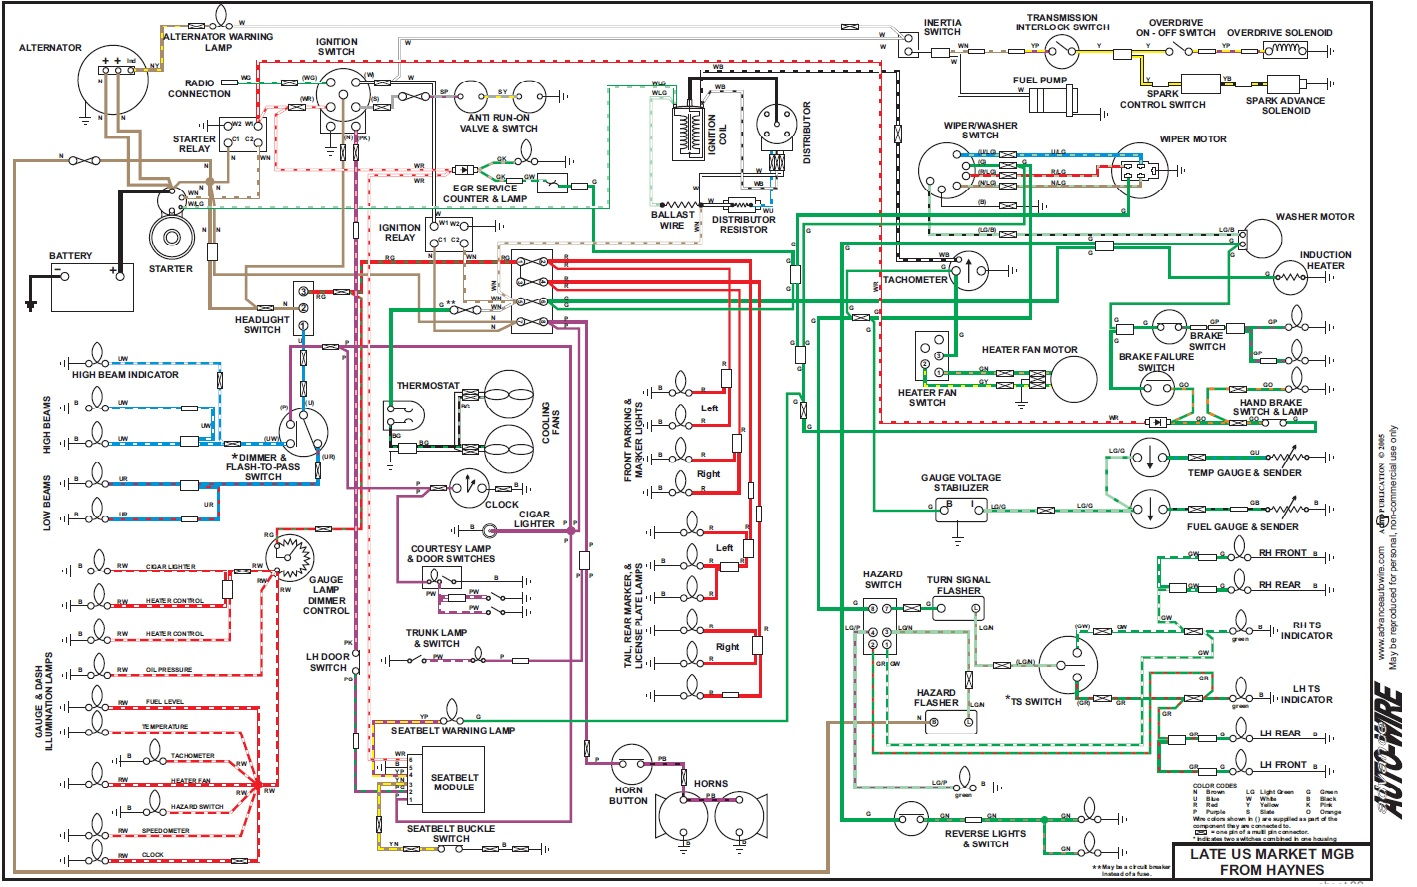 1979 Corvette Headlight Wiring Diagram Kenmore 80 Series Dryer Parts Mgb For Headlights 38